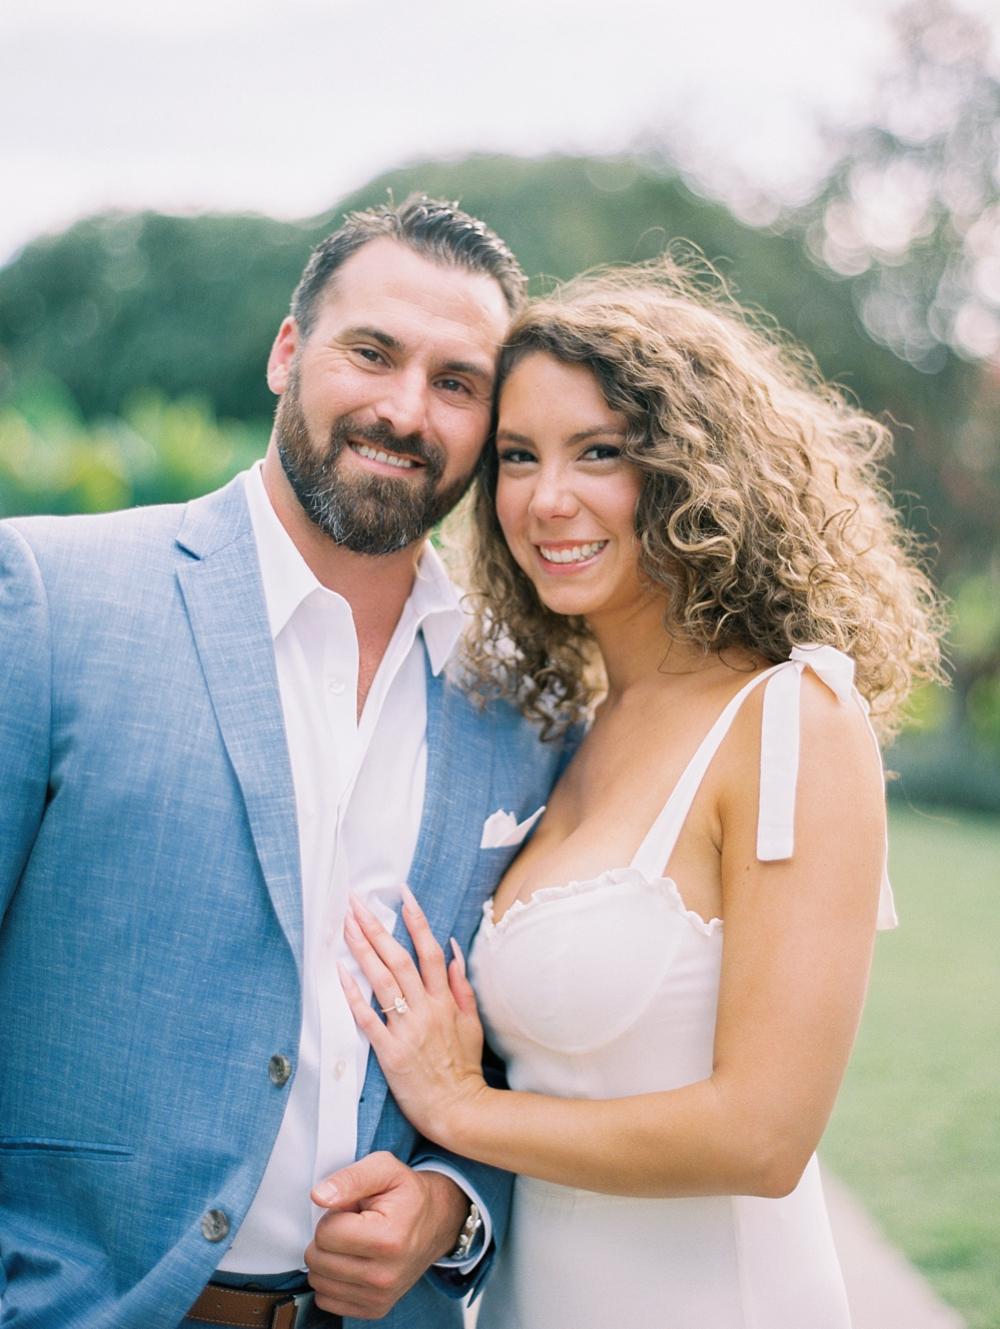 kristin-la-voie-photography-Dallas-Botanical-Garden-Arboretum-Engagement-fine-art-wedding-photographer-45